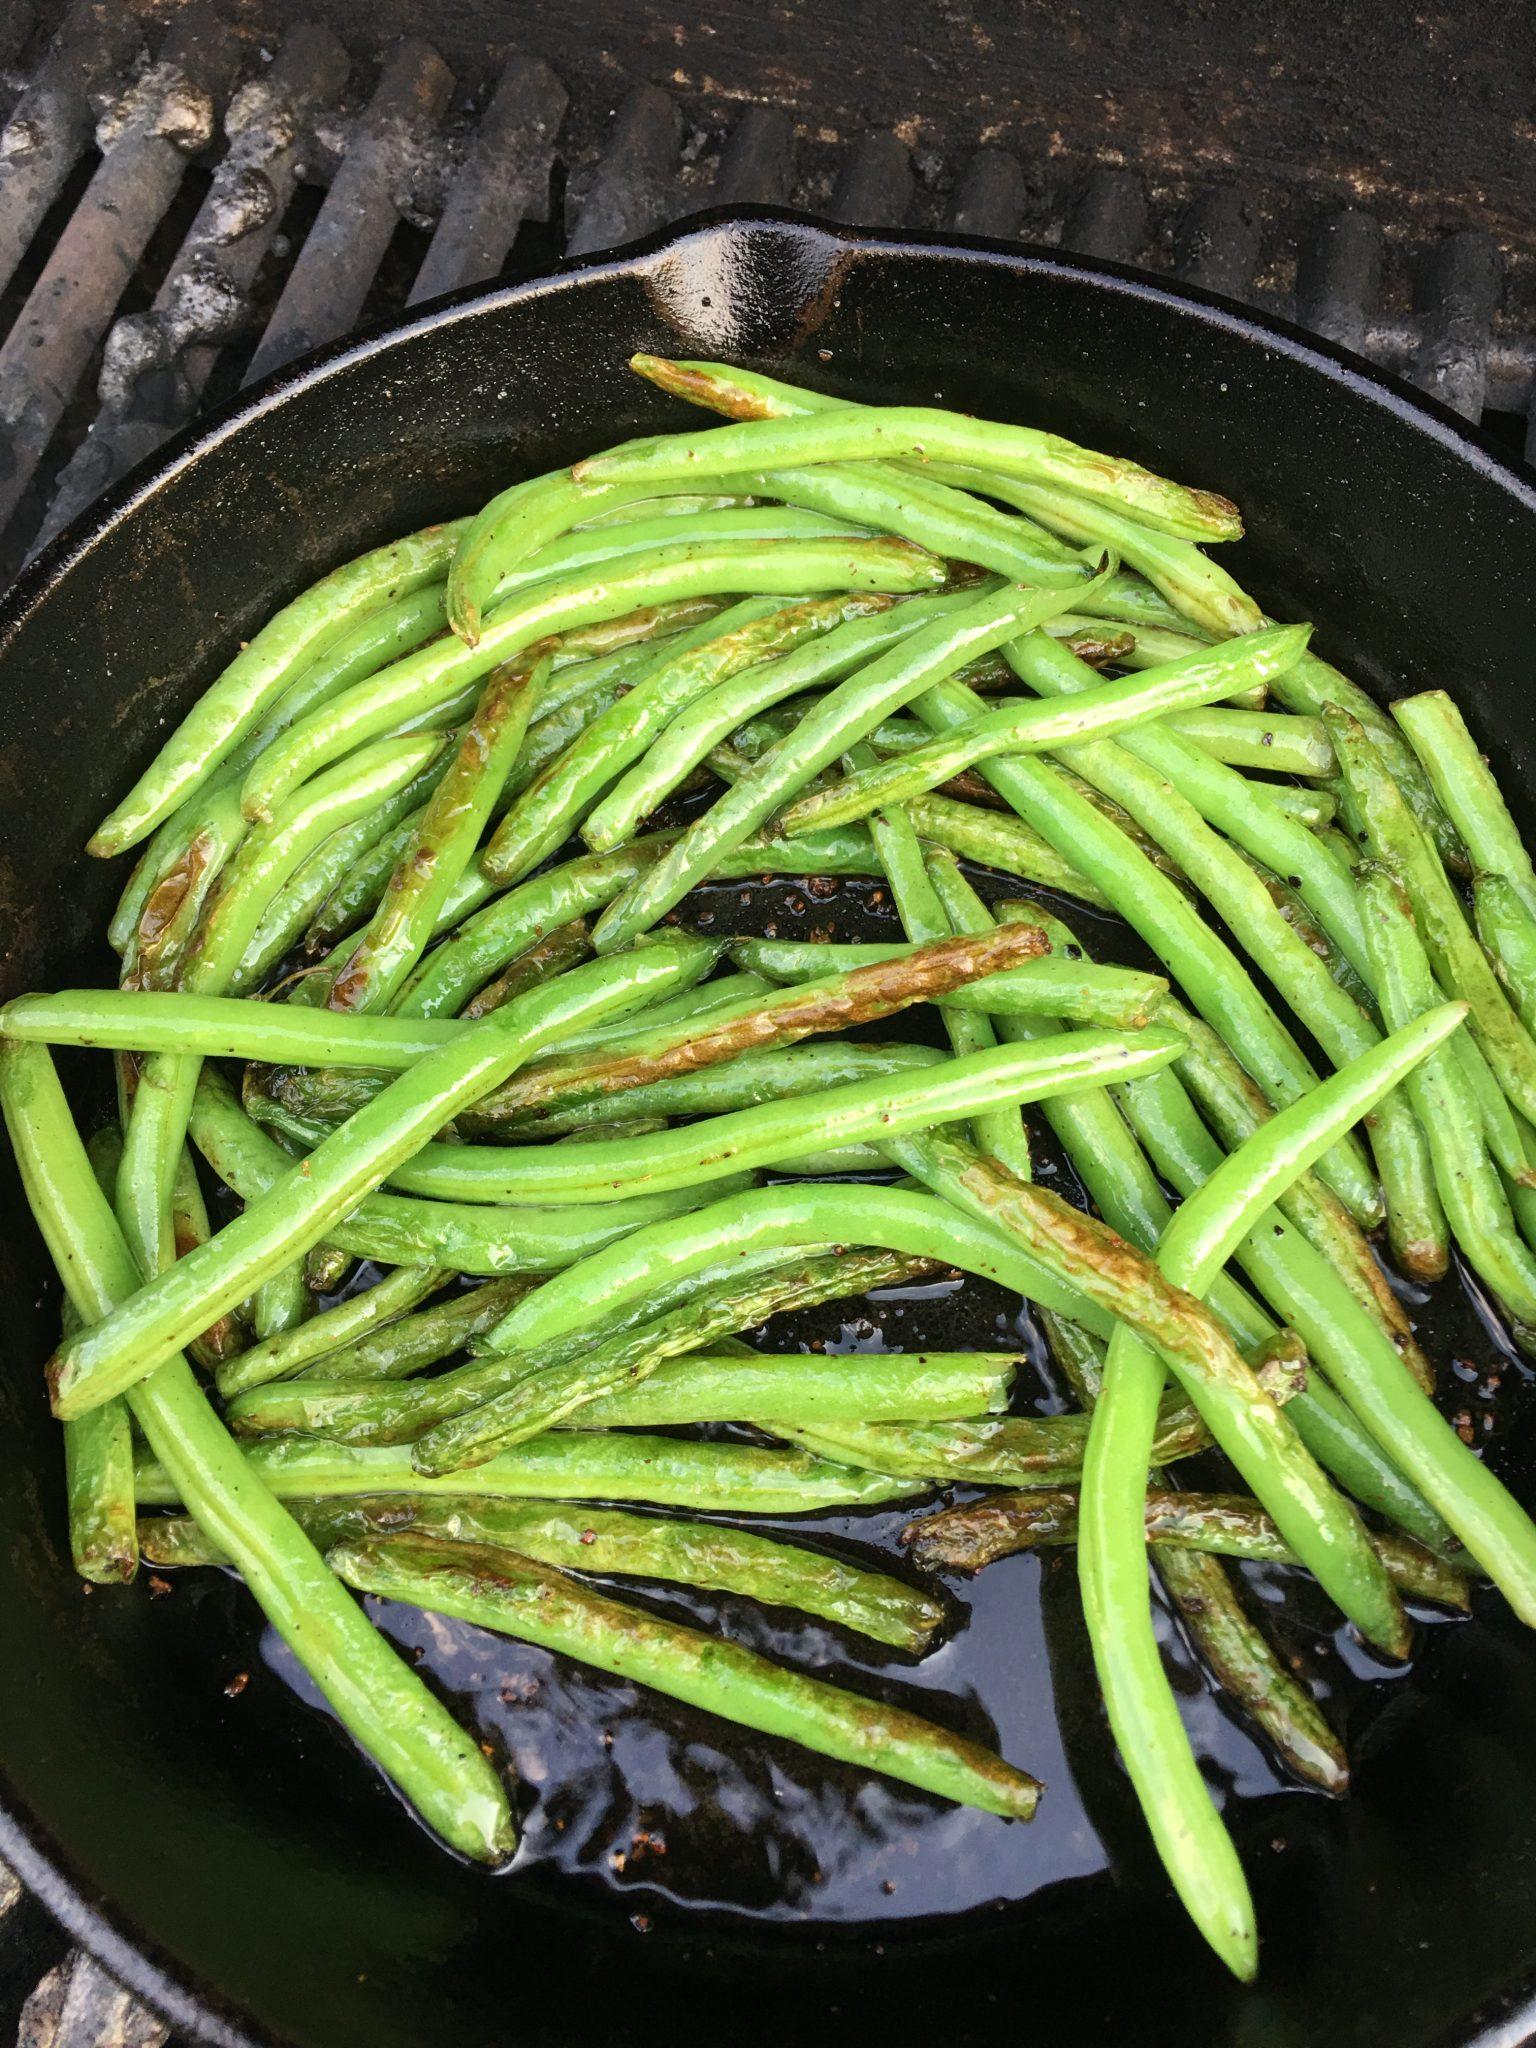 Skillet Grilled Green Beans